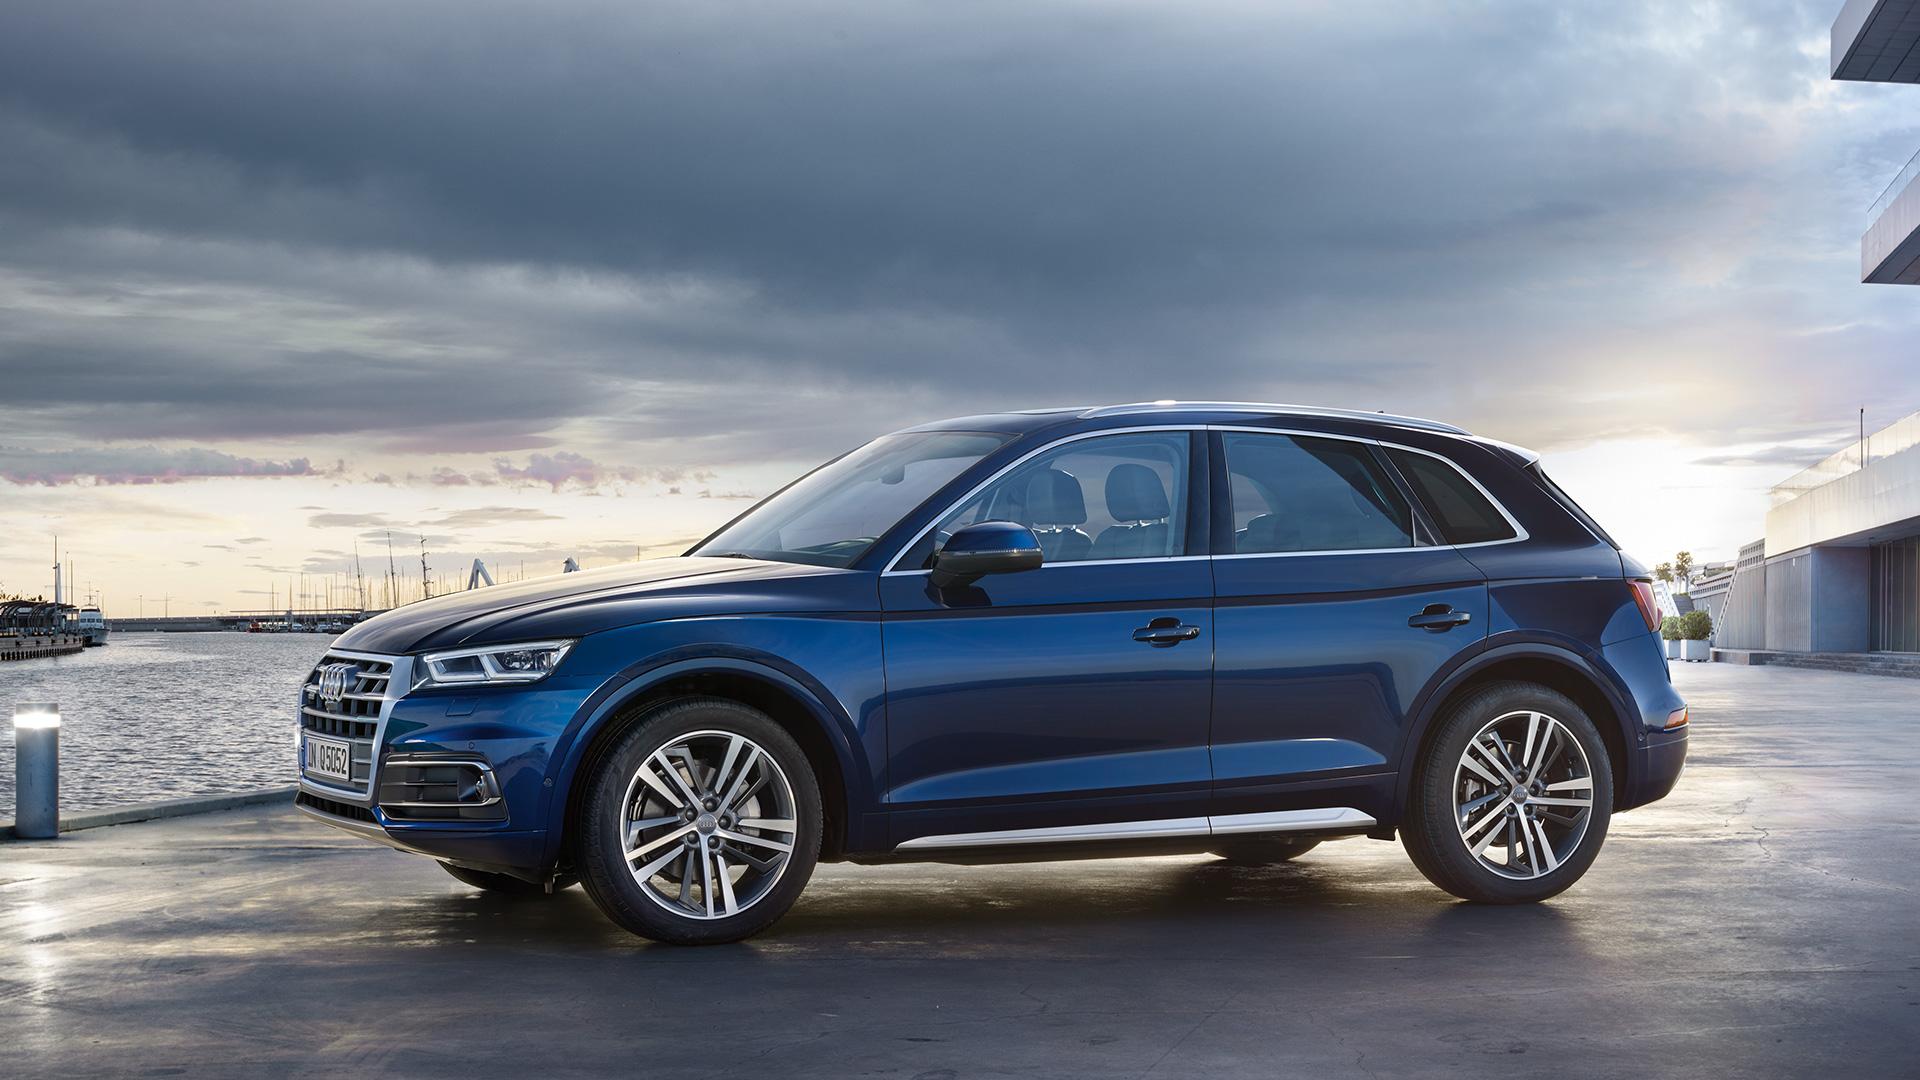 Kelebihan Audi Q5 2019 Tangguh